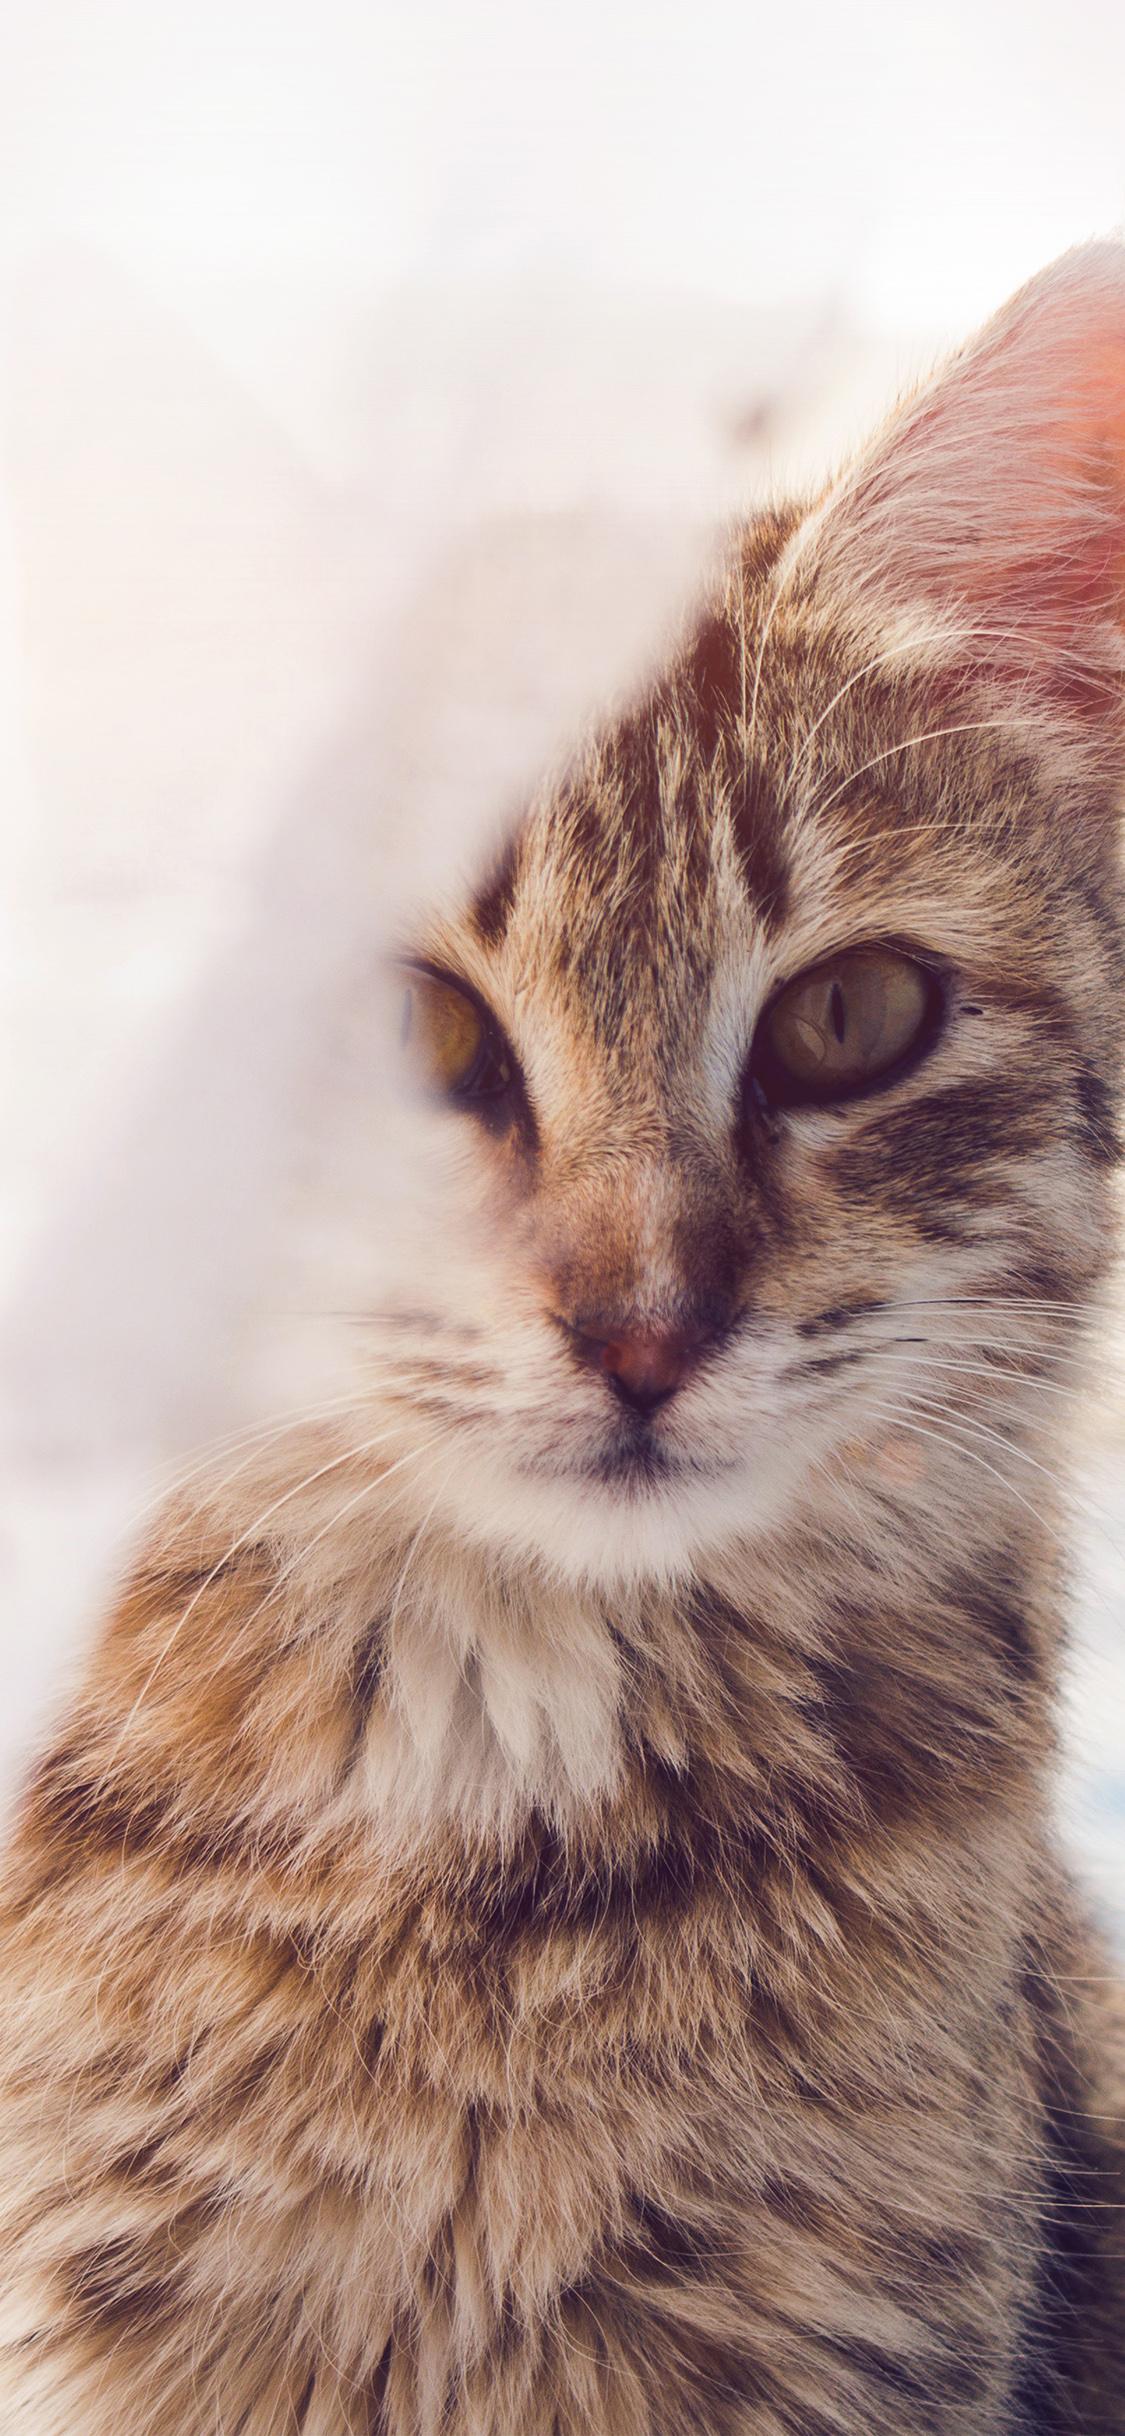 Nh82 Cat Watching You Eye Animal Cute Morning Kitten Flare Wallpaper